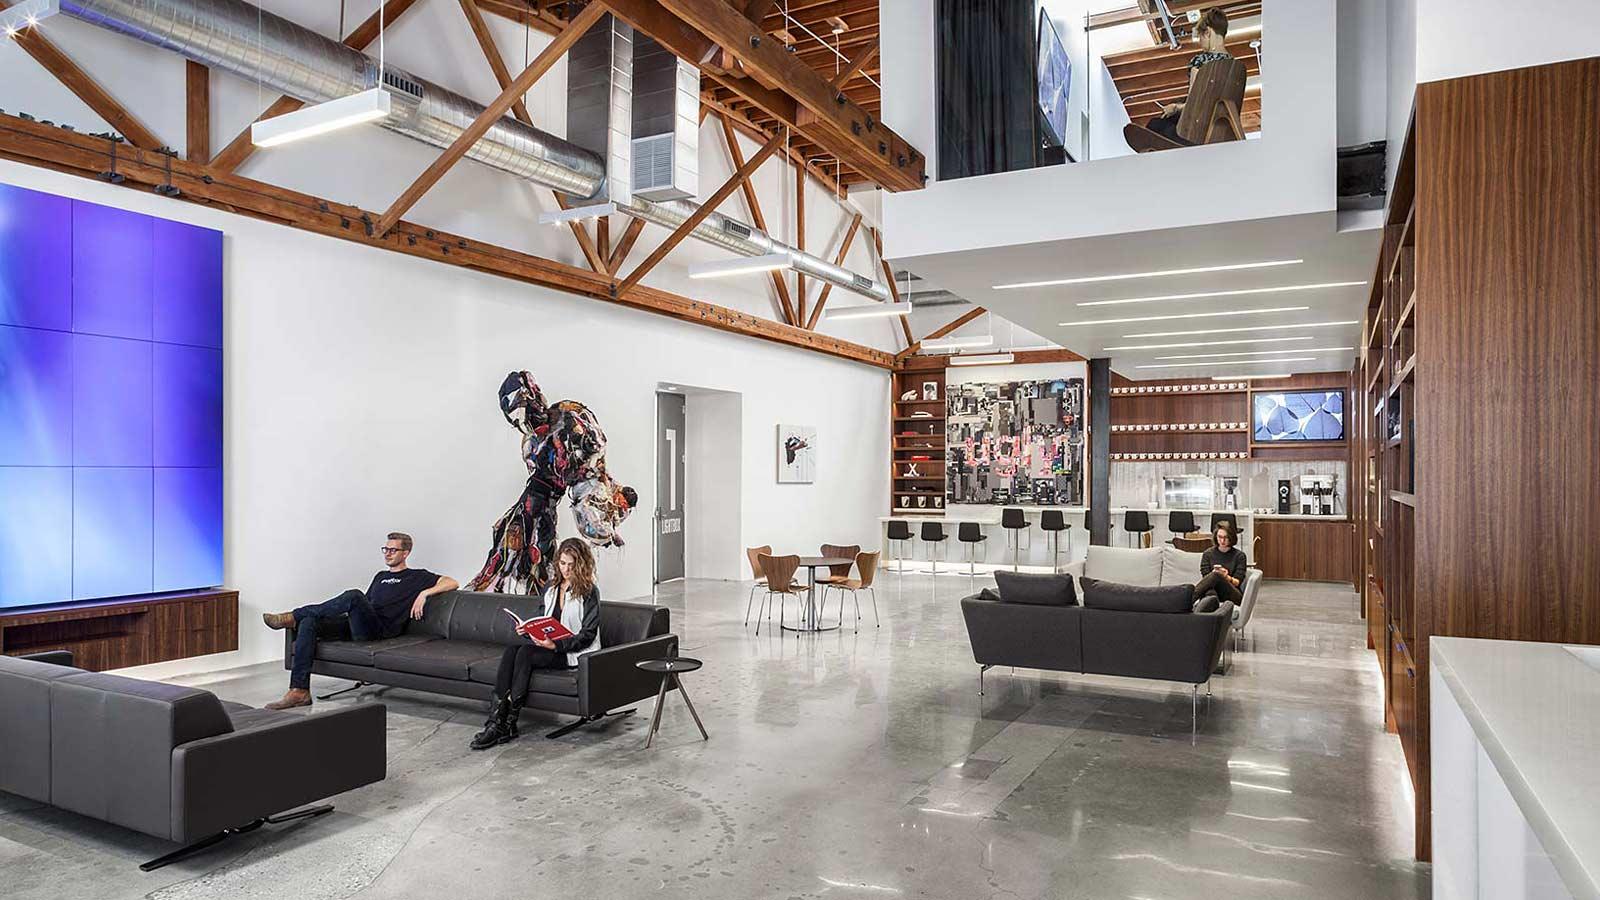 Gensler - Oakland community college interior design ...